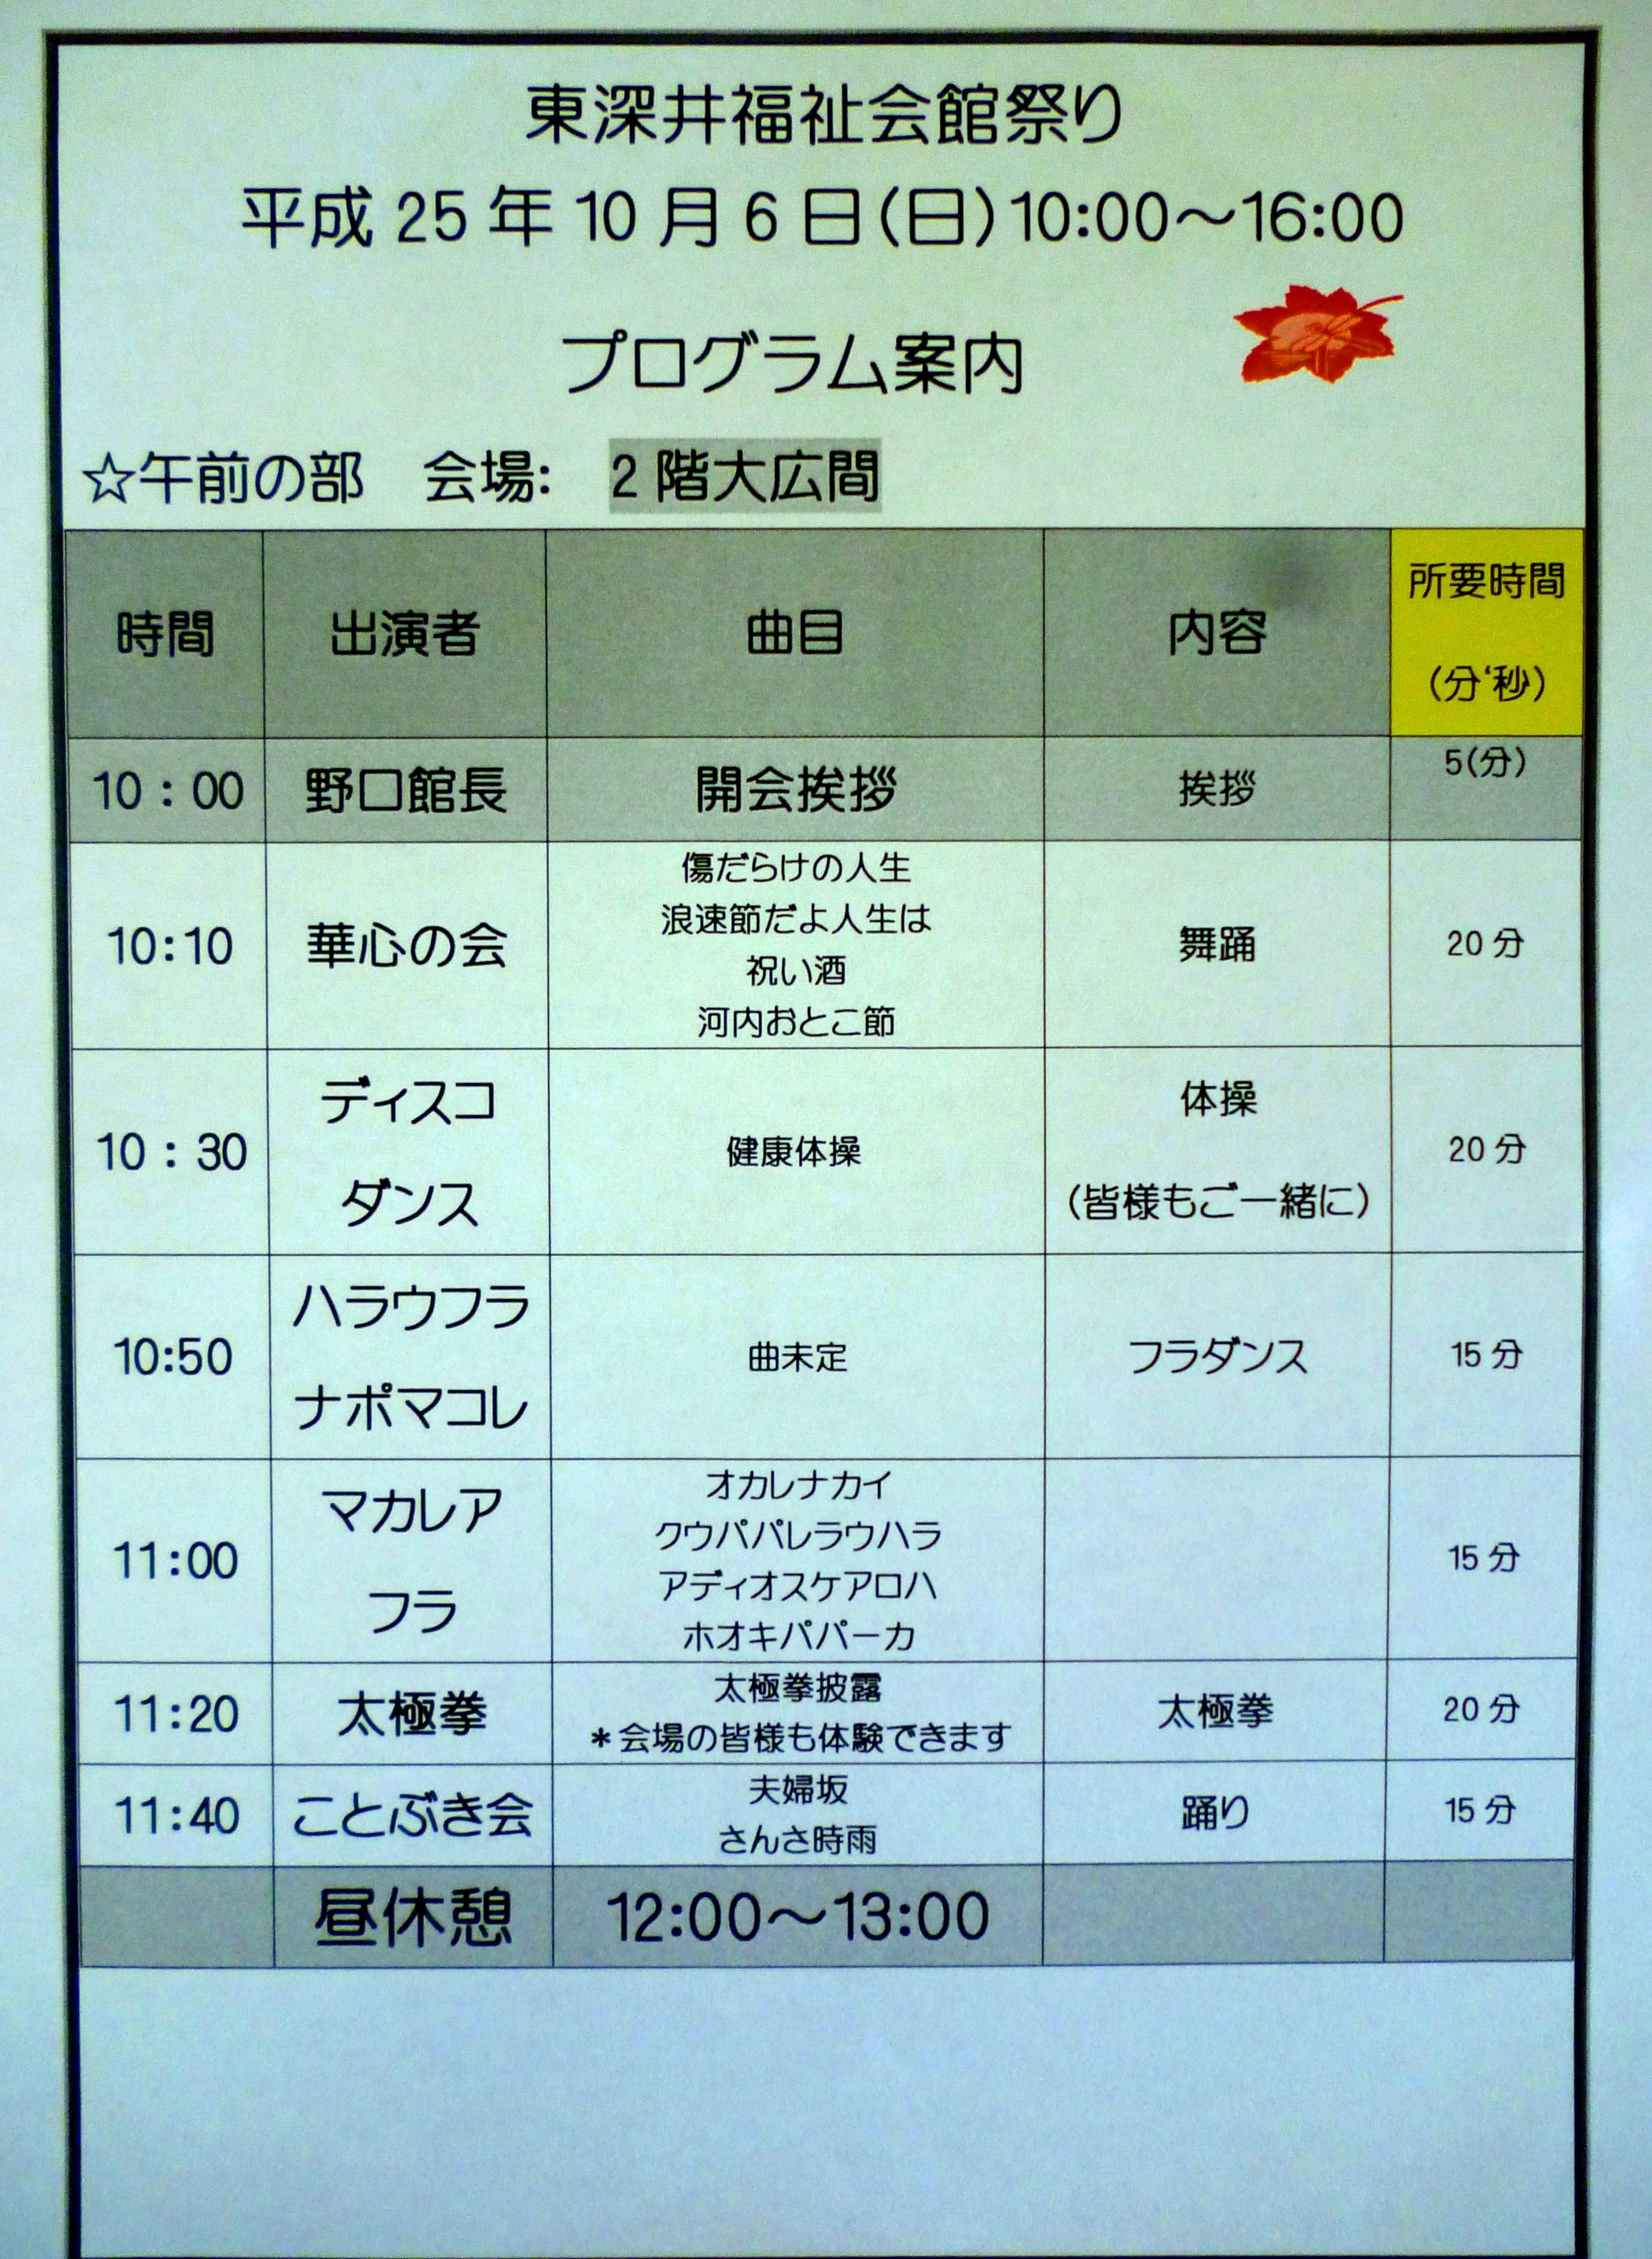 http://www.higashifukai-wh.org/news/2013/10/03/fest2/P1010144.JPG